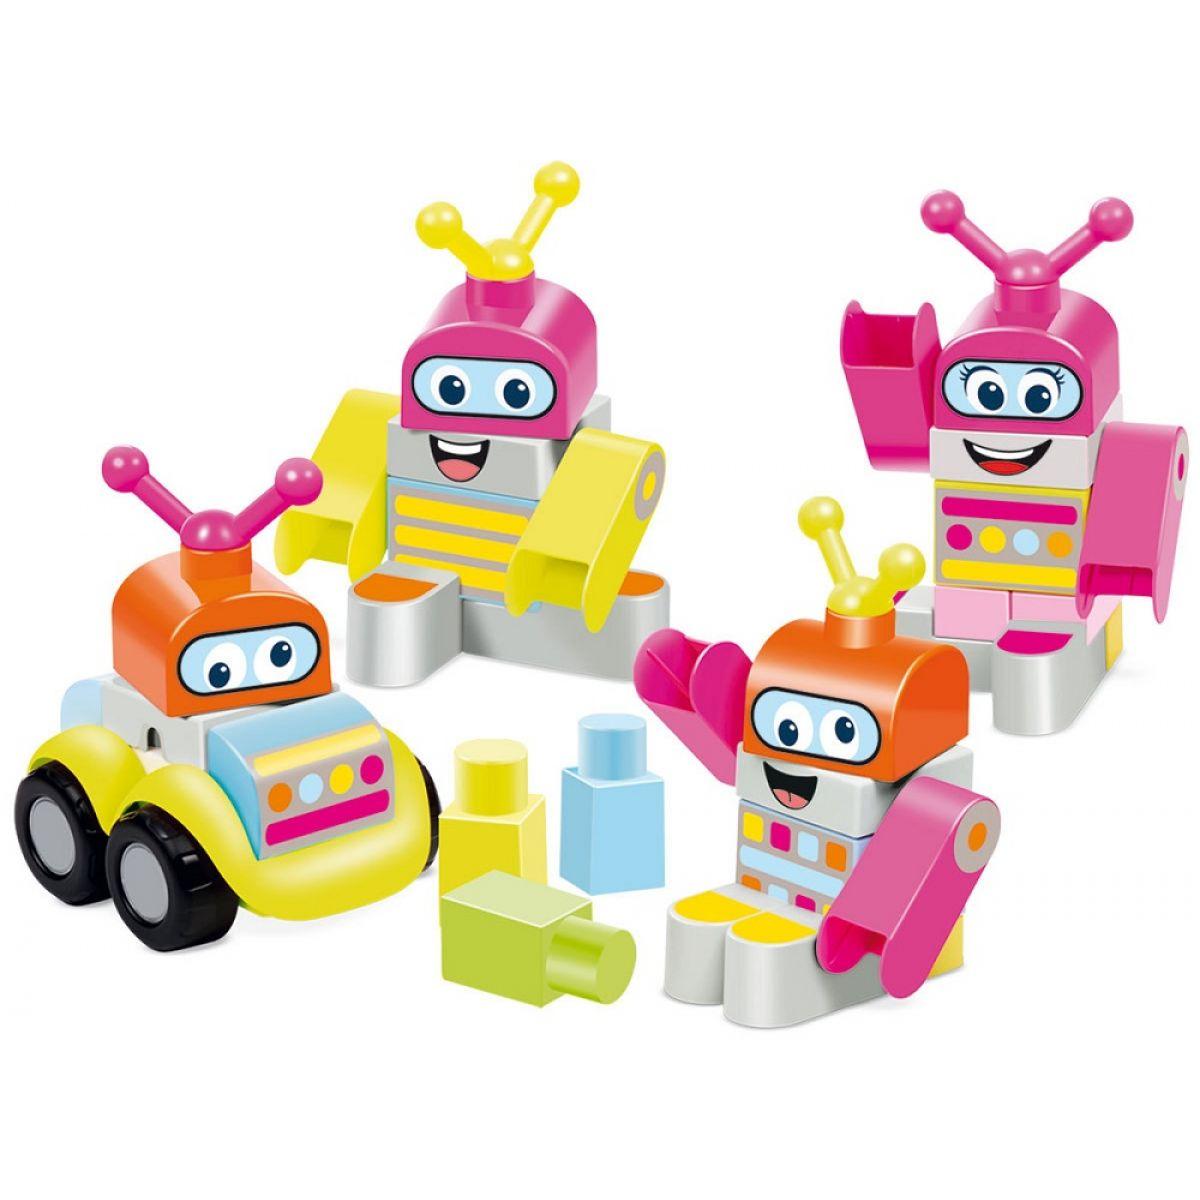 Abrick 7772 Maxi Kostičky roboti